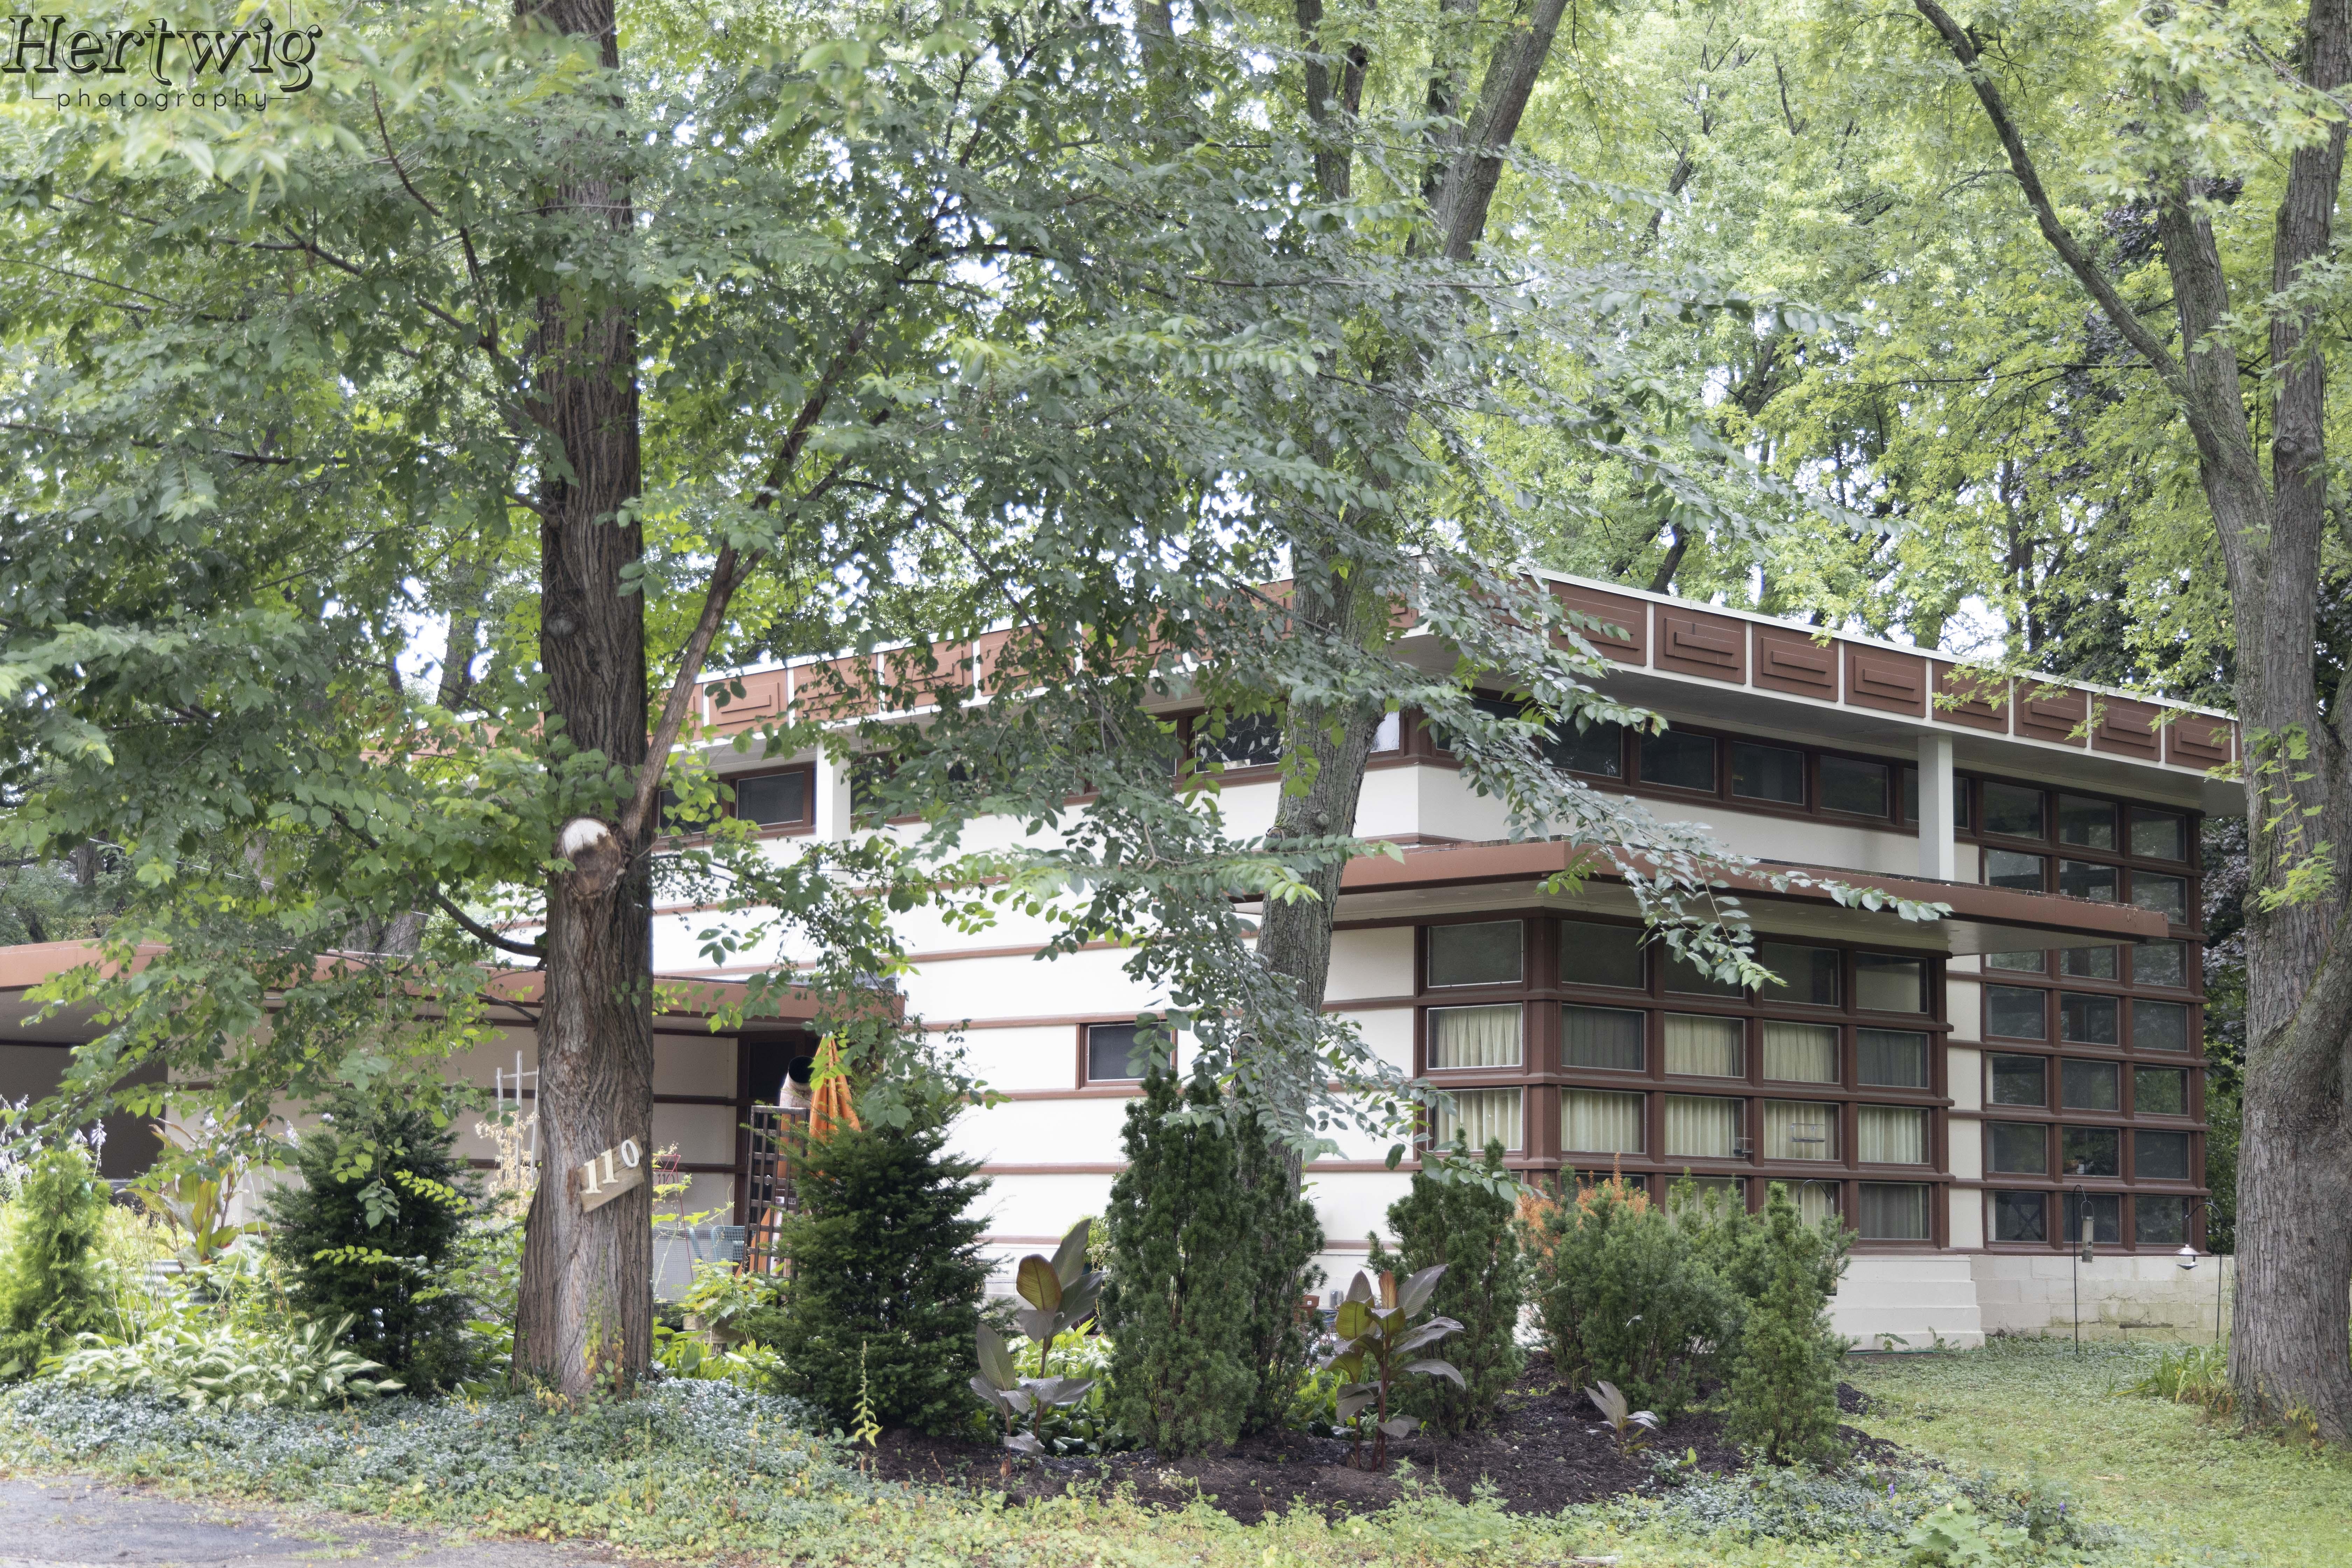 Walter Rudin House